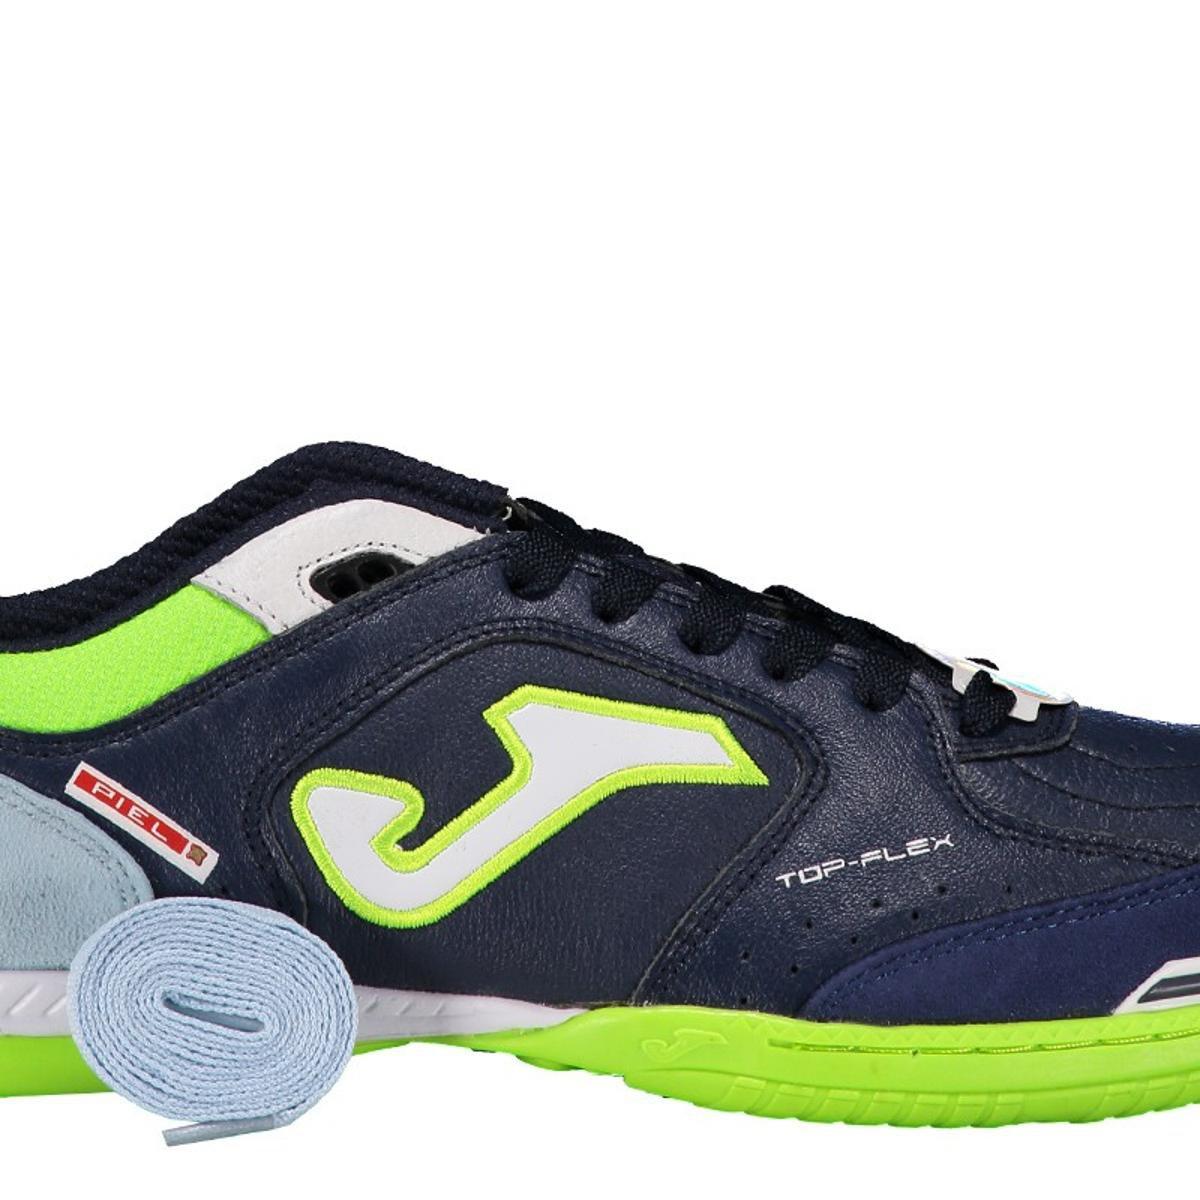 d9a06faa68 ... Chuteira Joma Top Flex Futsal Masculina. Chuteira Joma Top Flex Futsal  Masculina - Marinho+Verde Limão